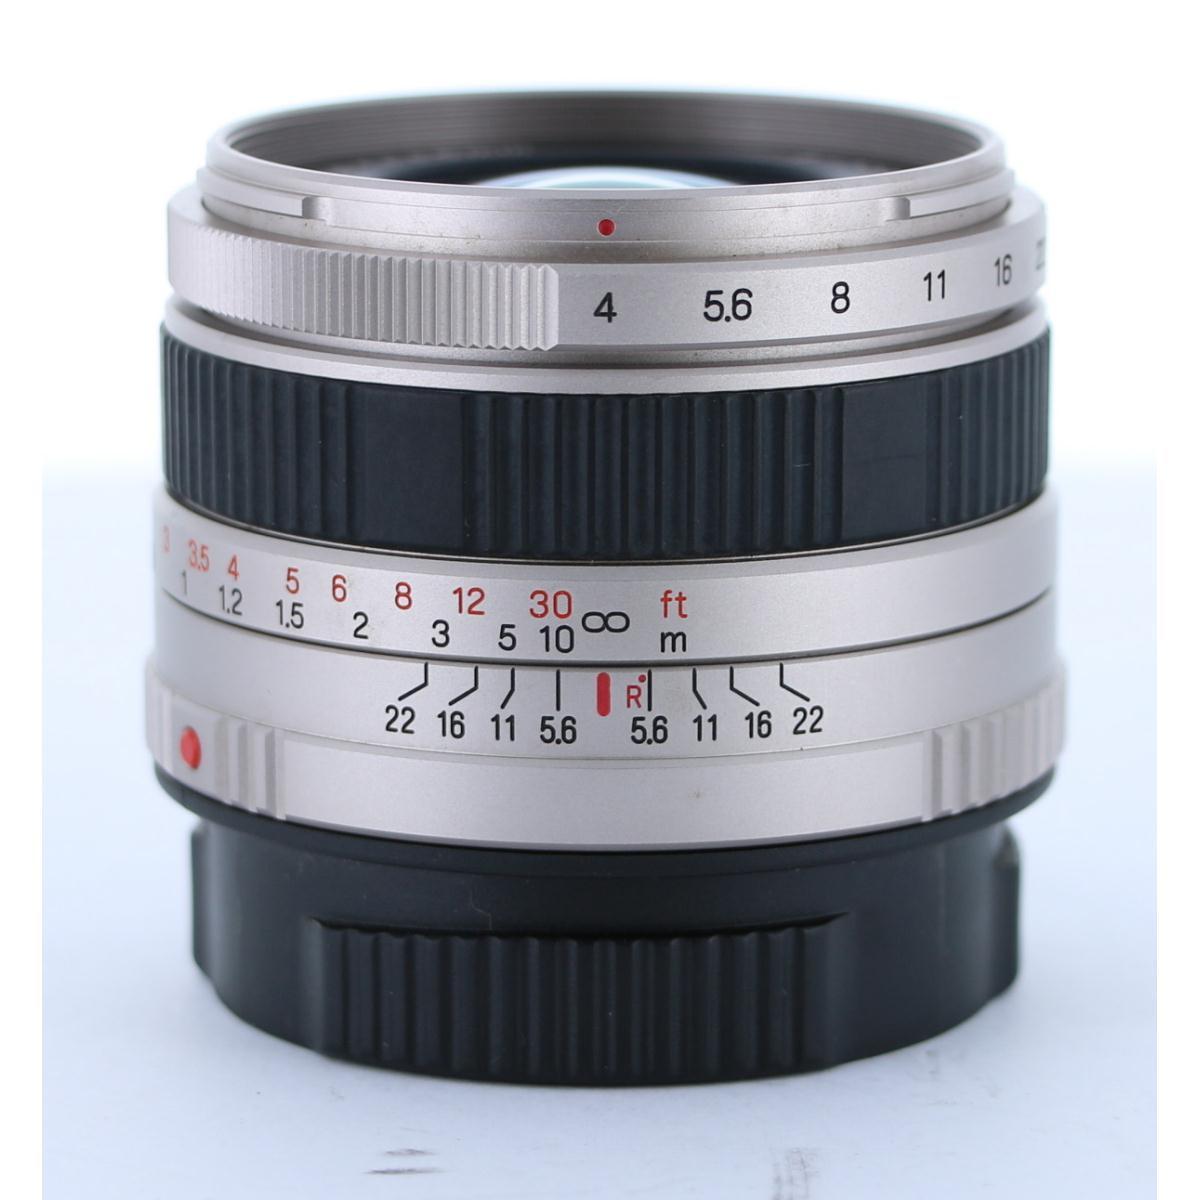 FUJIFILM FUJINON 45mm F4【中古】